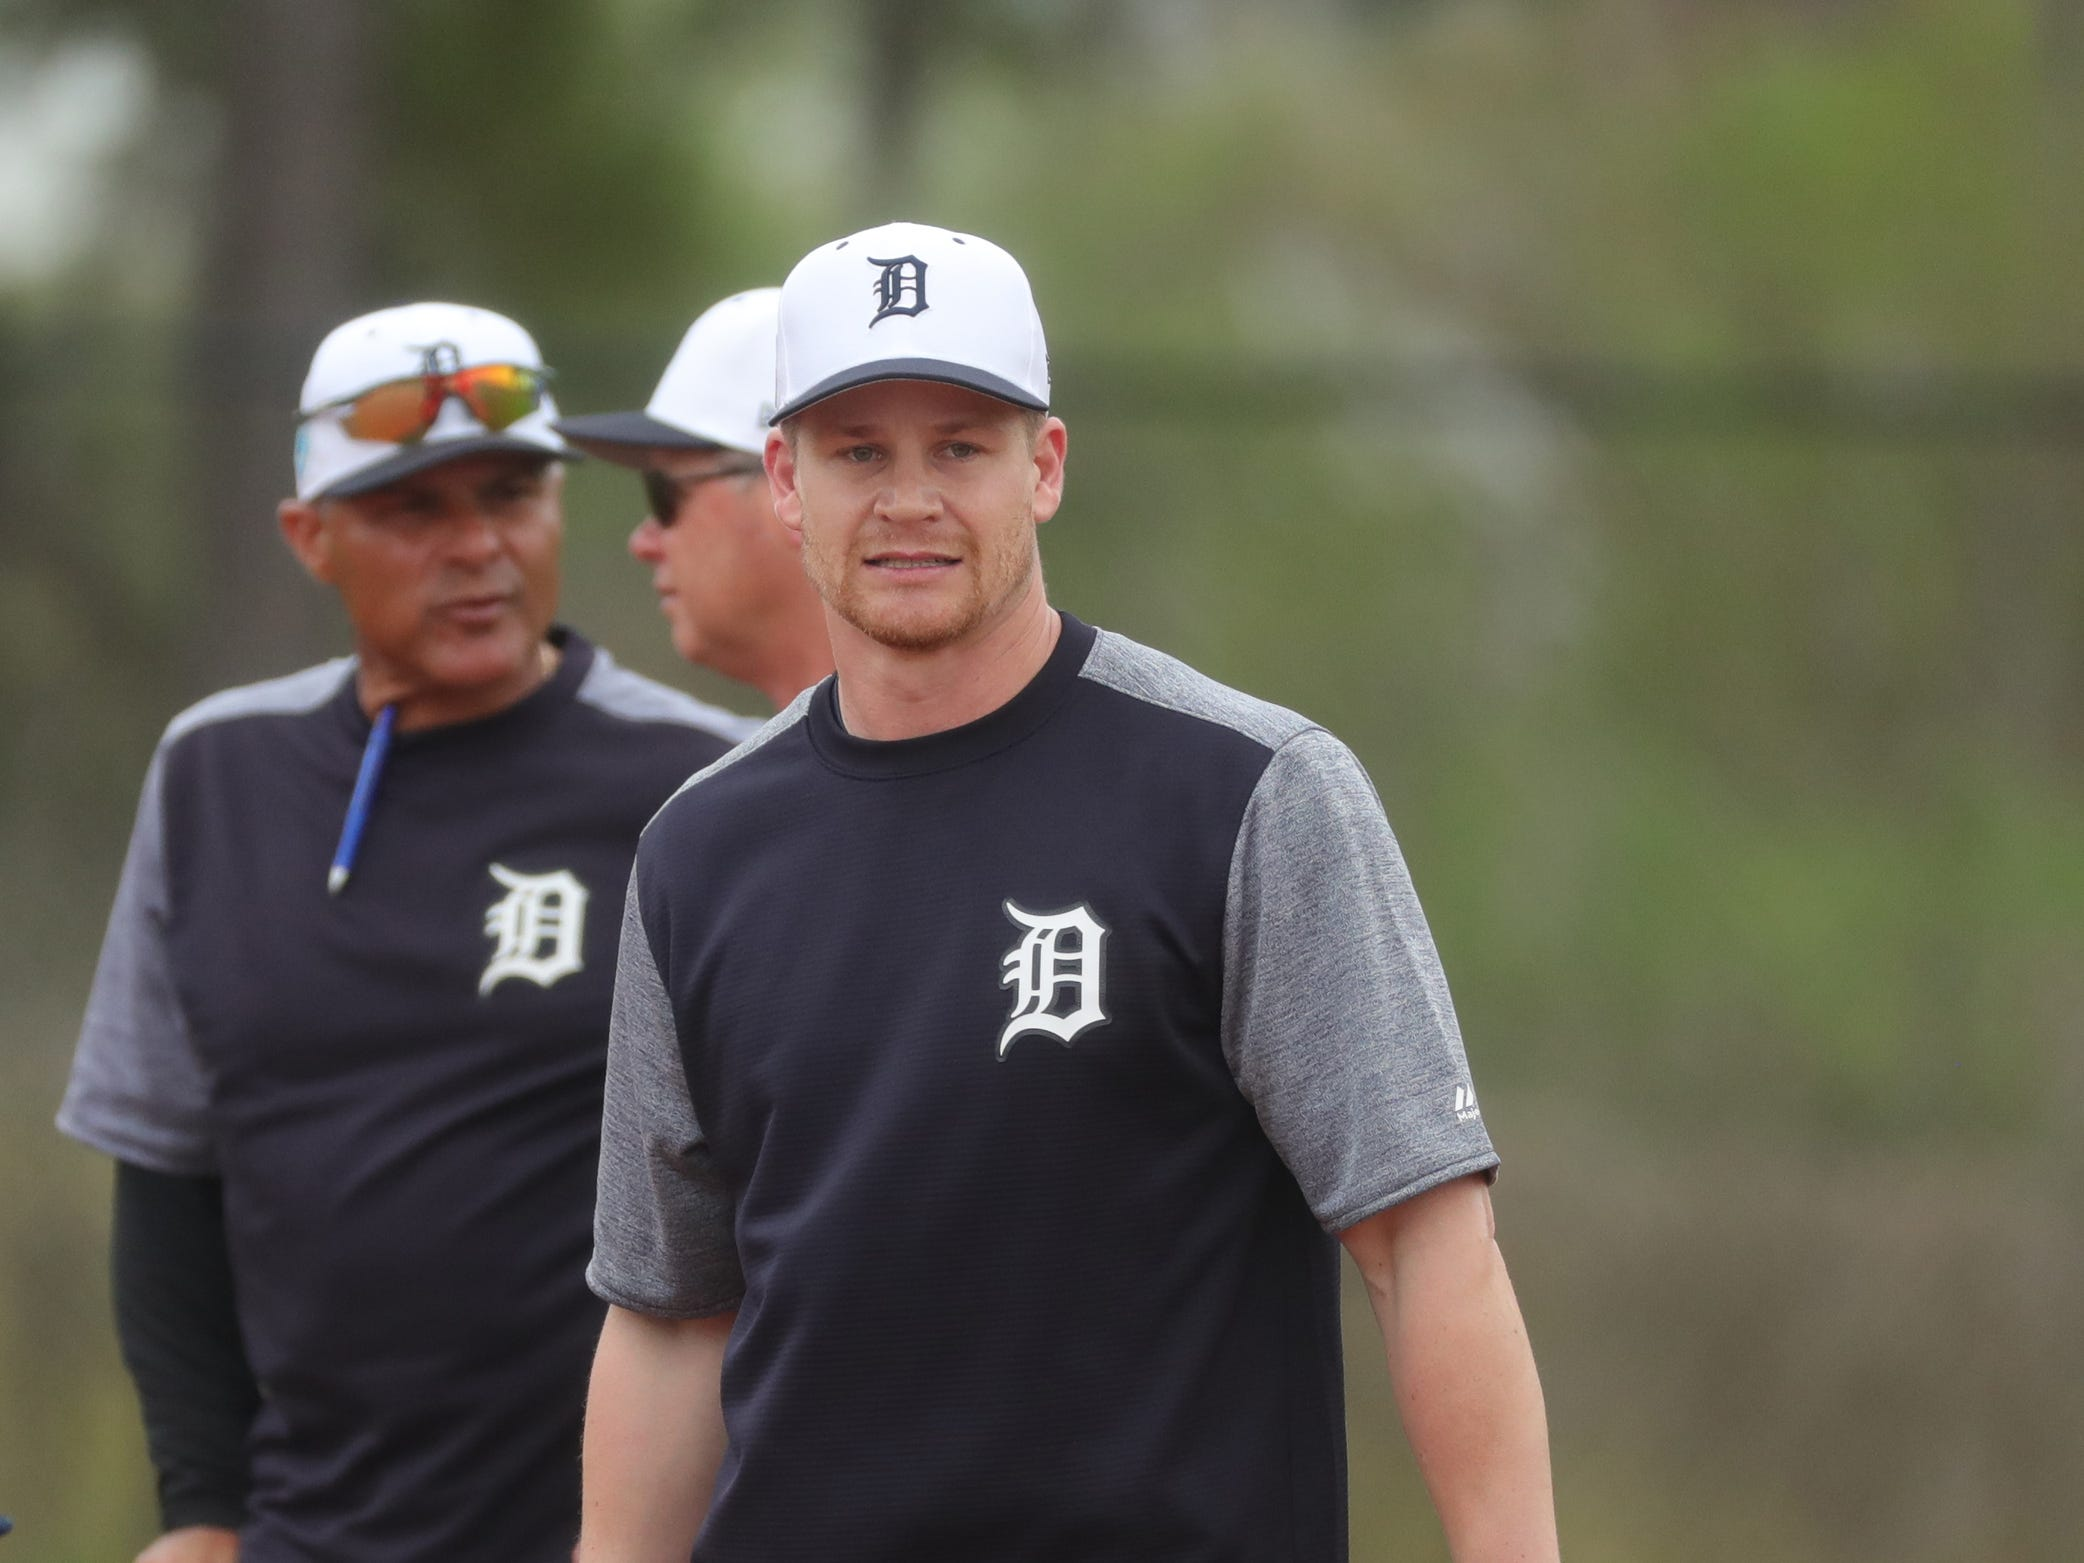 Detroit Tigers infielder Gordon Beckham at second base during practice Monday, Feb. 18, 2019 at Publix Field at Joker Marchant Stadium in Lakeland, Fla.